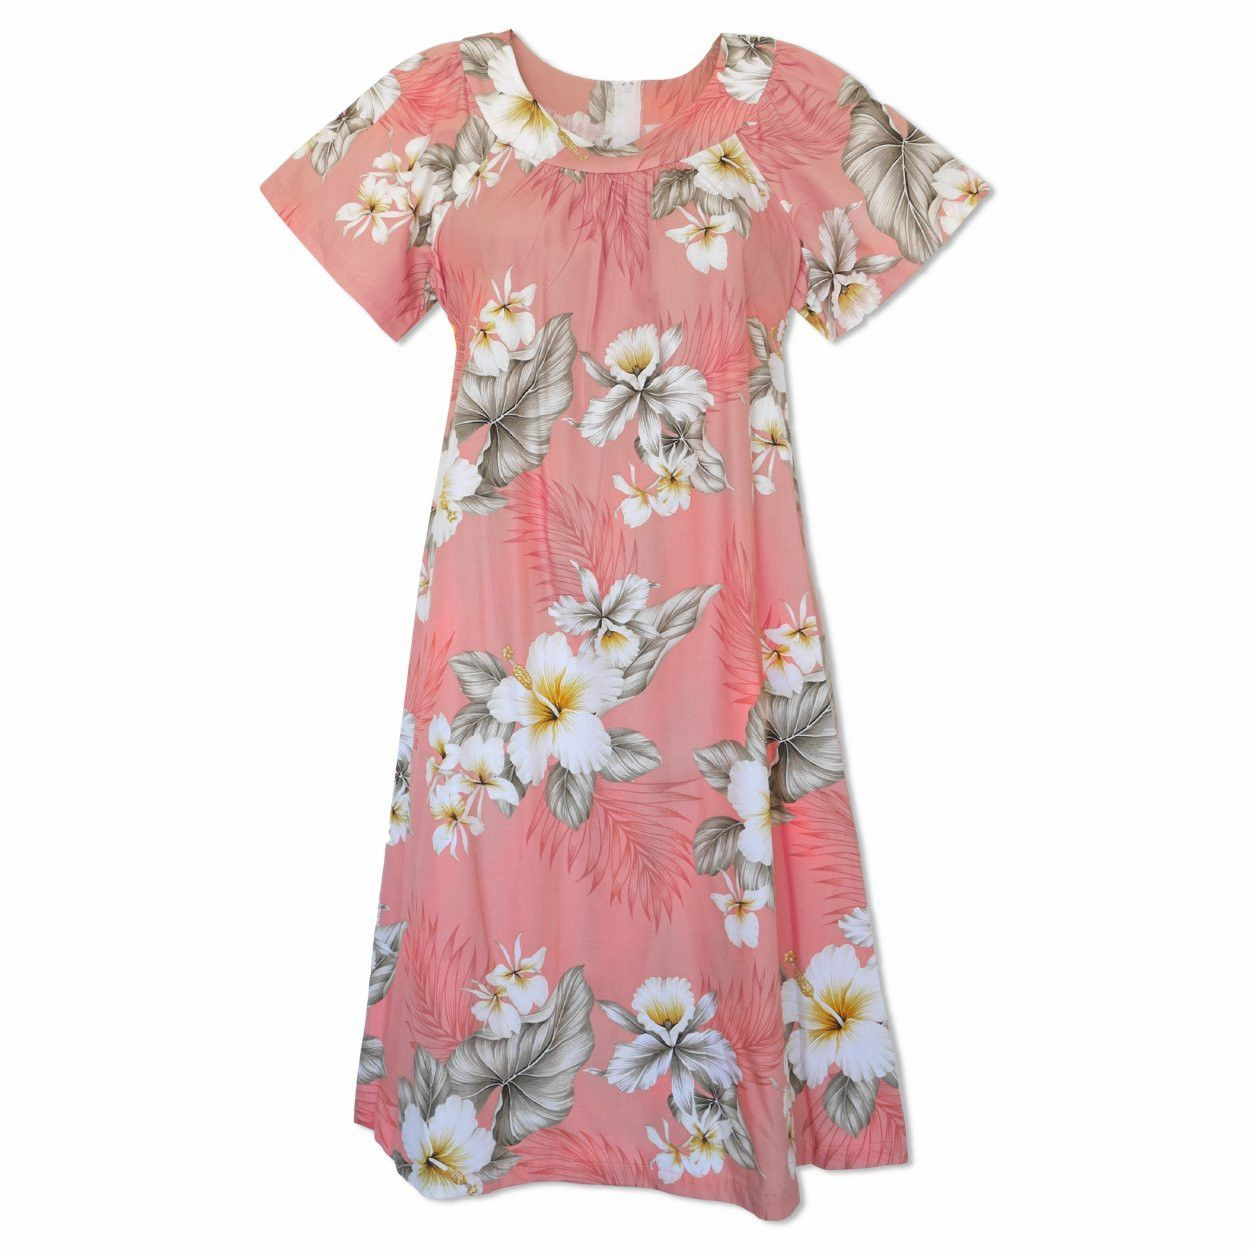 Hibiscus Joy Pink Cotton Hawaiian Muumuu Dress